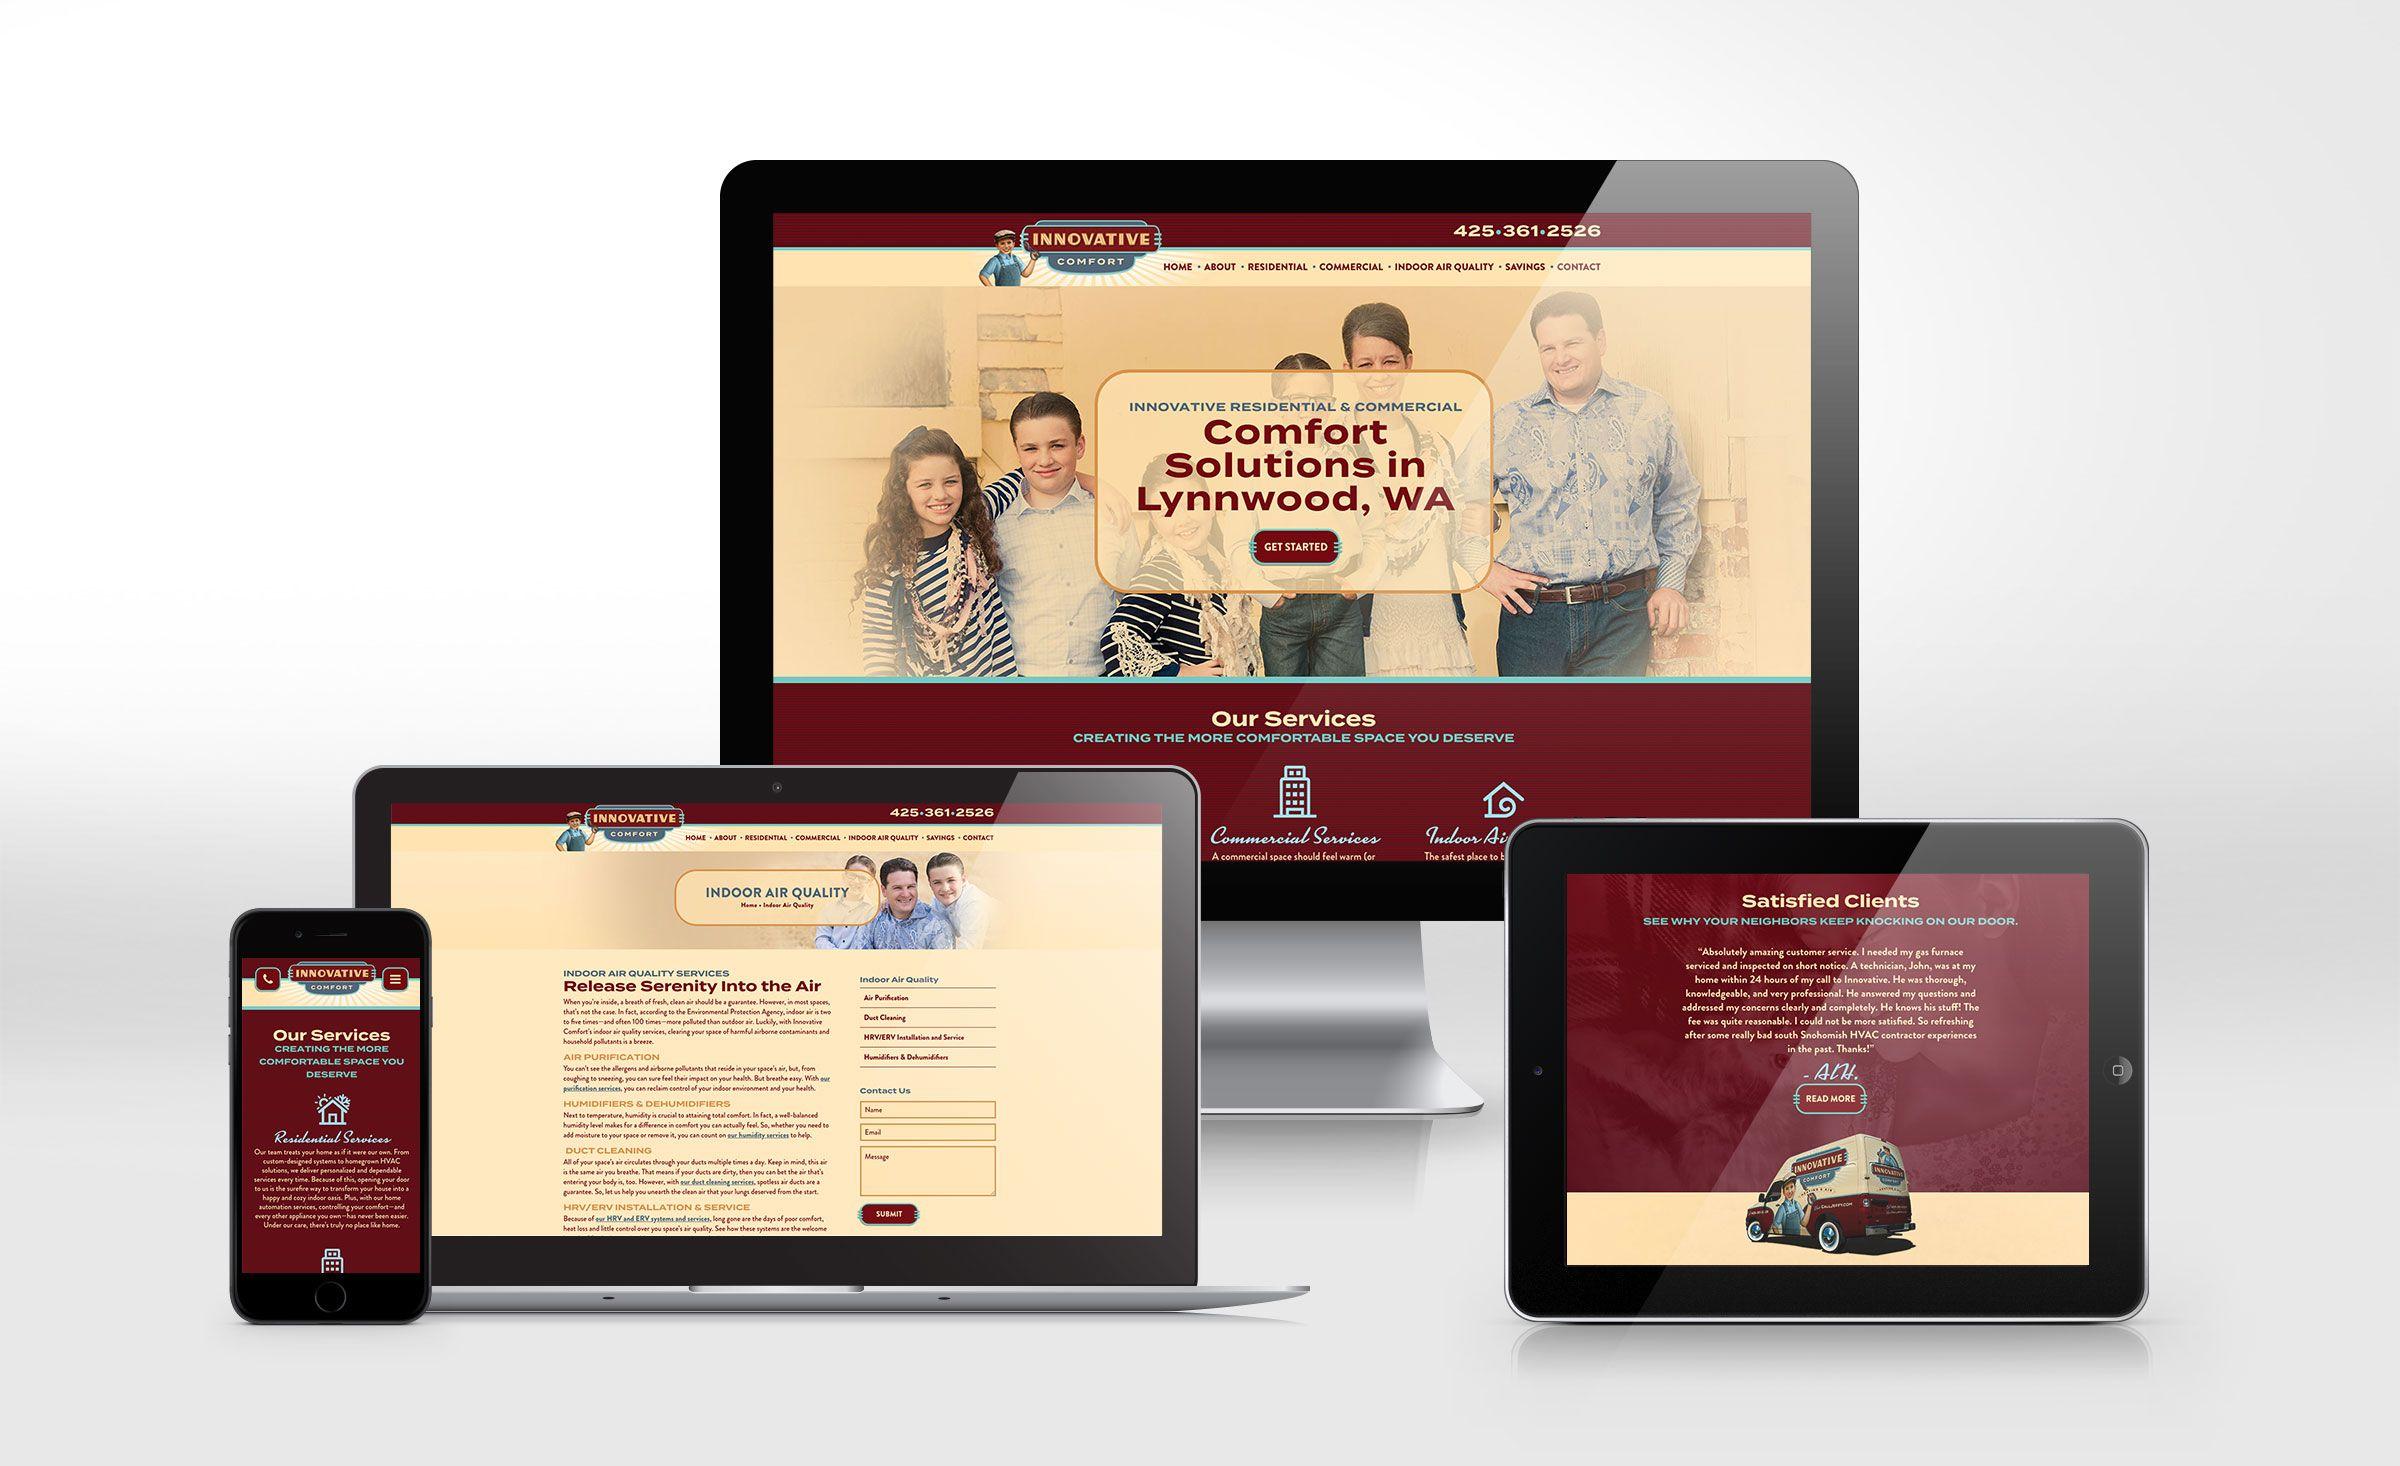 Website Design For Innovative Comfort Nj Advertising Agency Nj Ad Agency Nj Web Design Nj Logo Design Webs Portfolio Web Design Brand Strategy Innovation